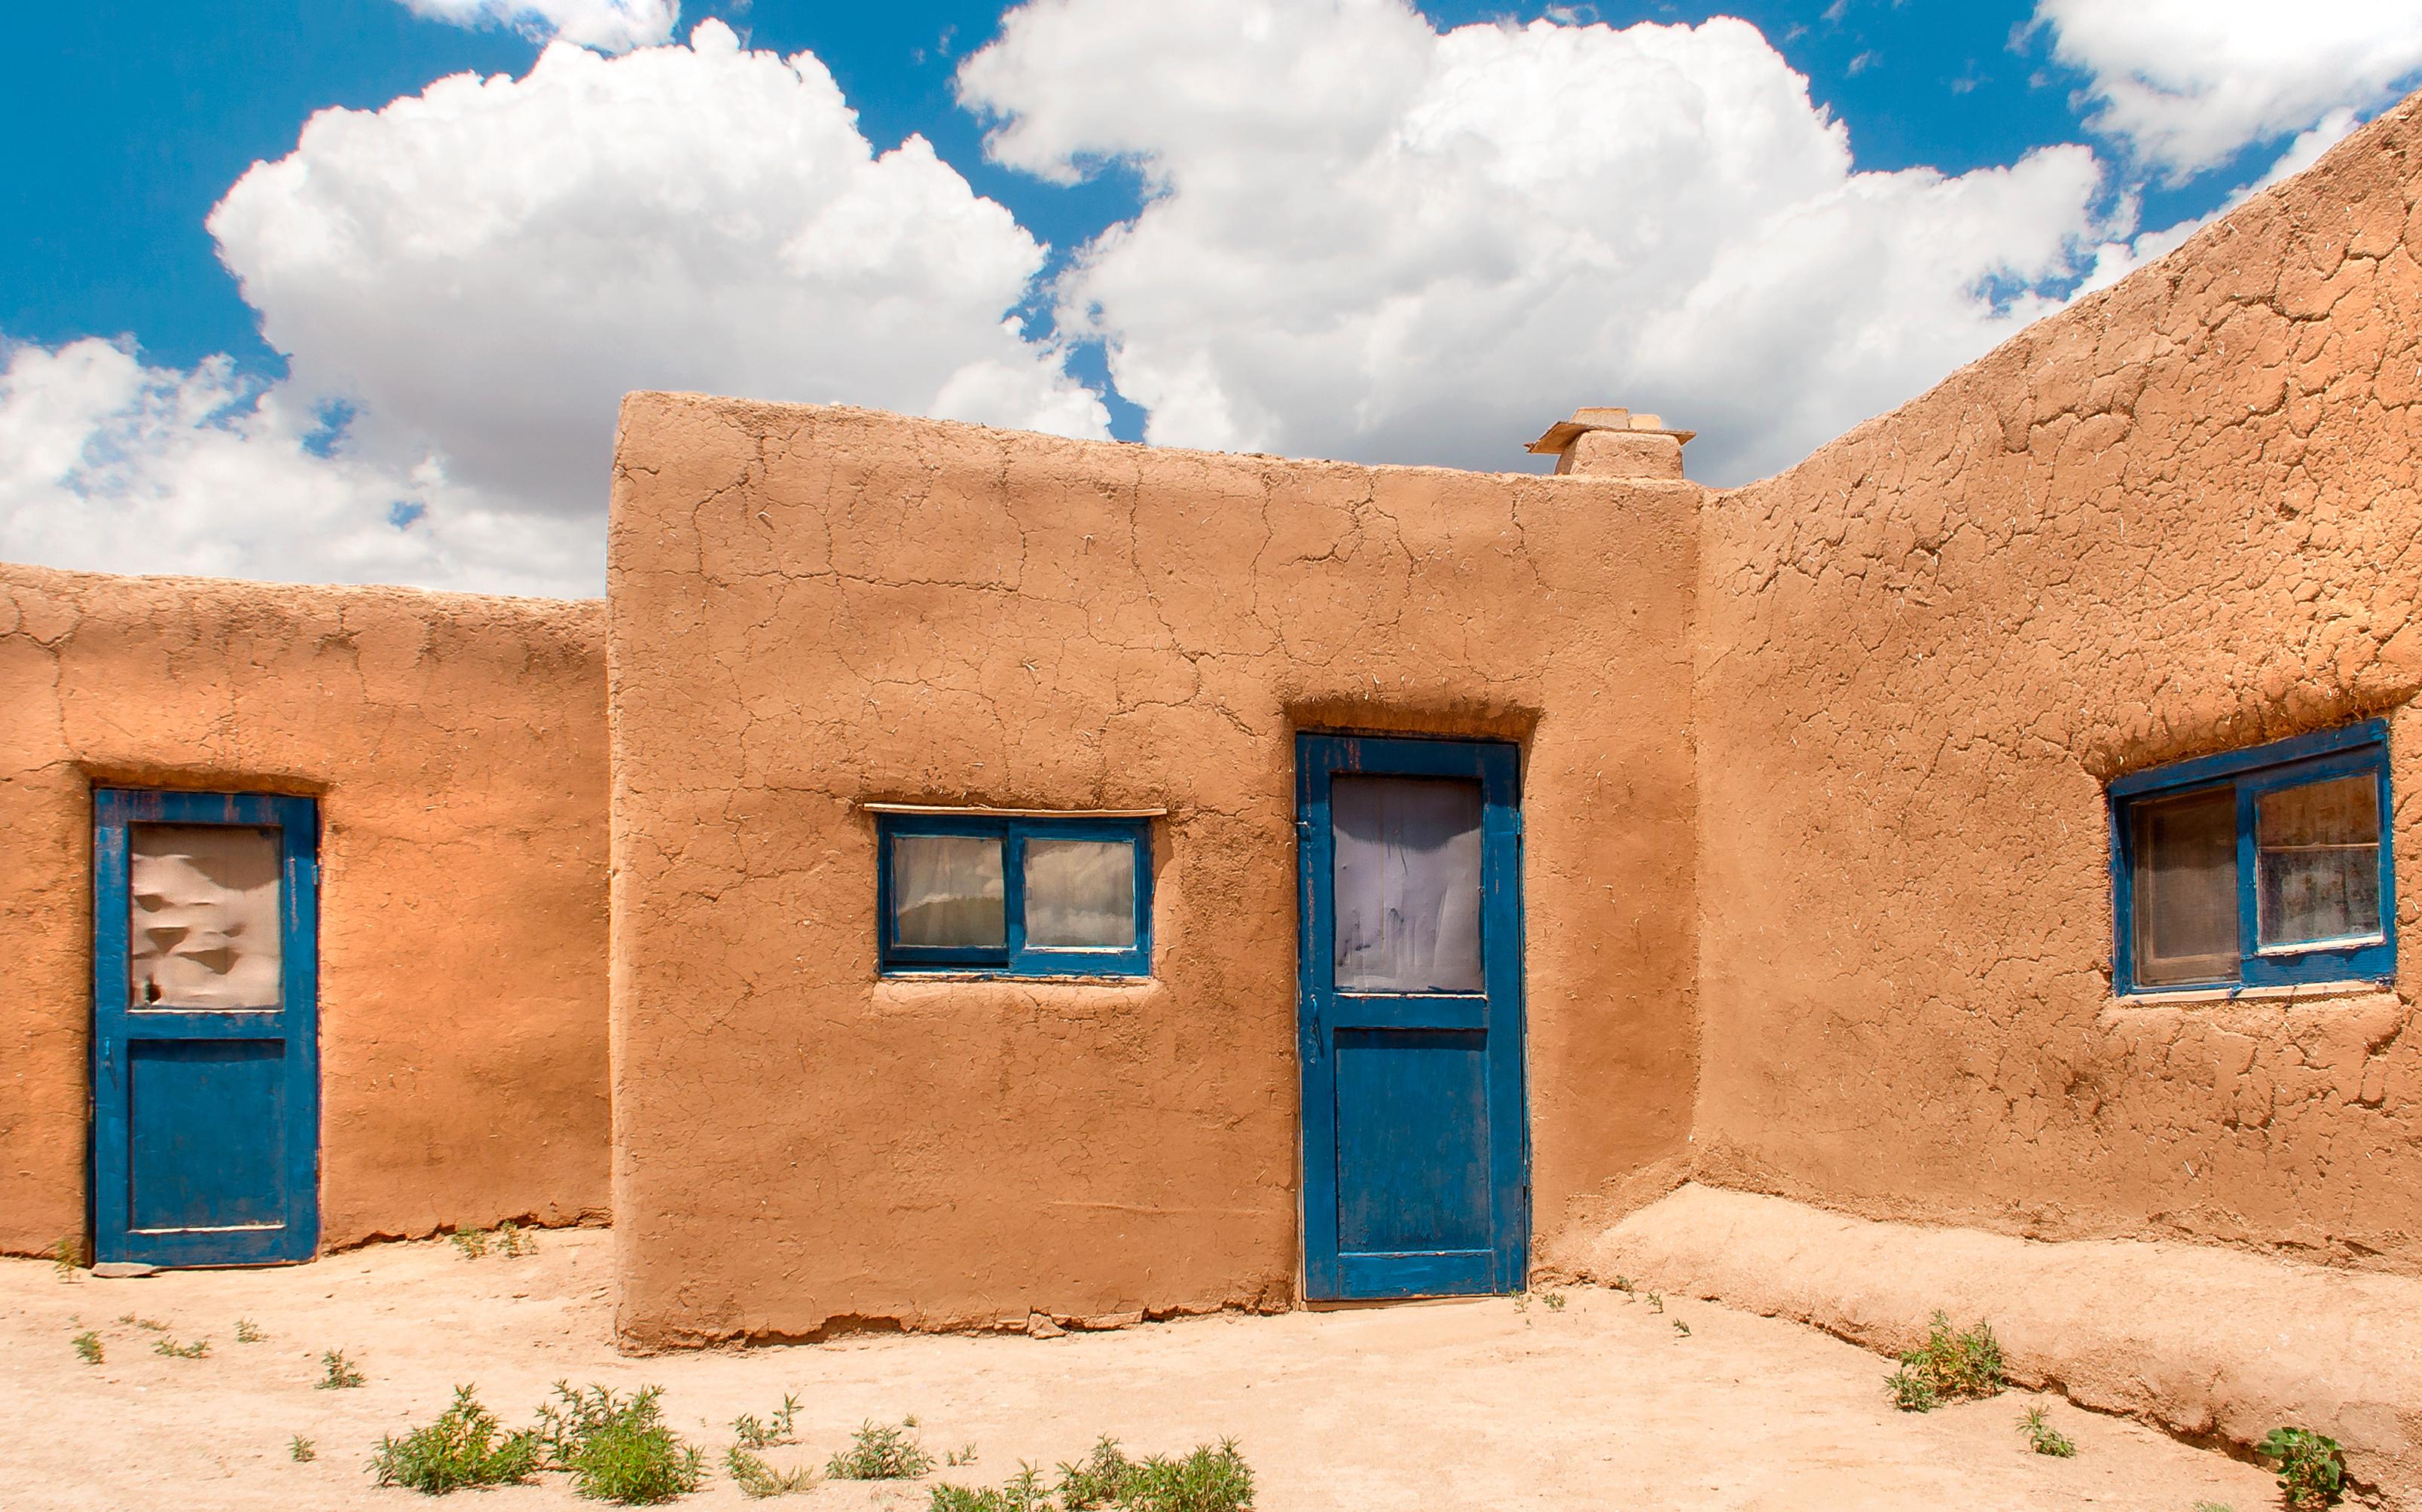 Top Adobe Building Home - architecture-house-desert-window-building-home-wall-vacation-village-orange-color-facade-blue-door-pueblo-adobe-estate-newmexico-msh0814-fotocompetitionbronze-hacienda-msh081420-ancient-history-458324  Trends_639788.jpg